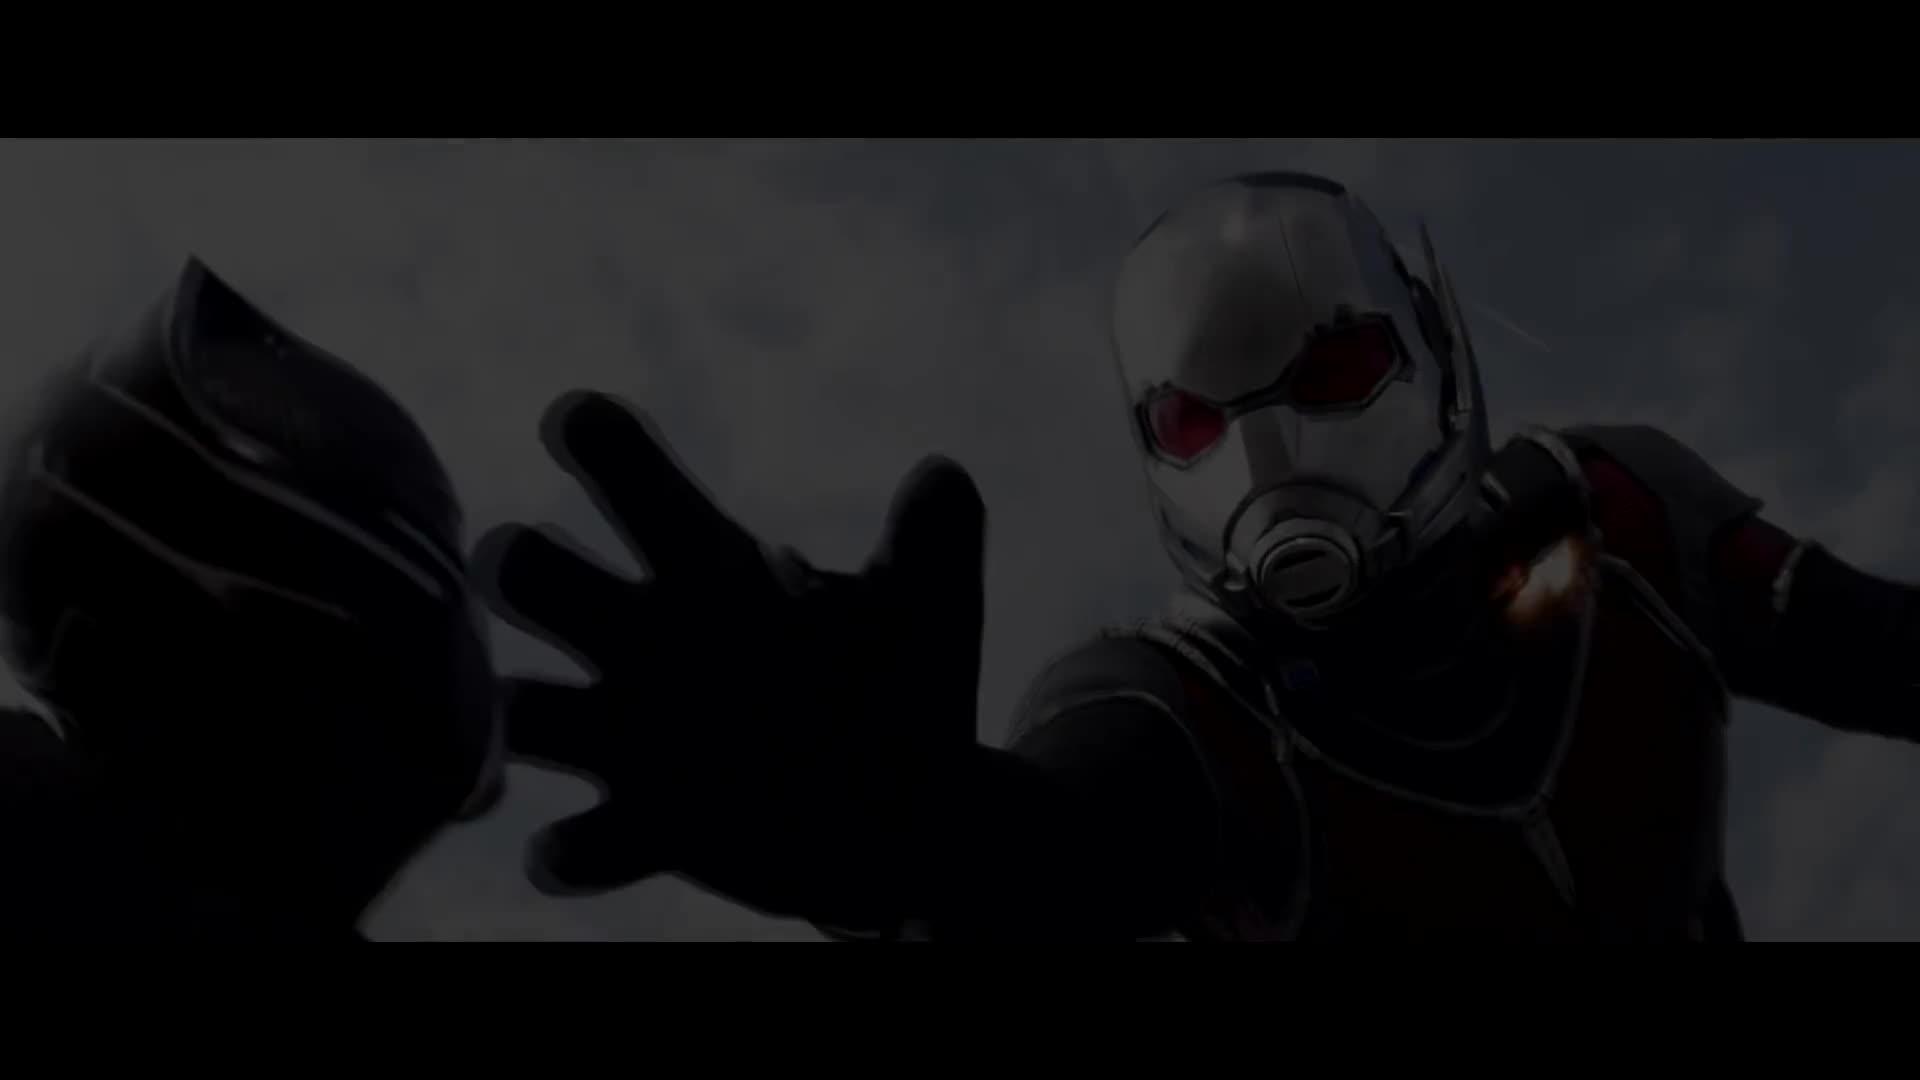 marvelstudios, Spiderman in Captain America: Civil War (1080p) GIFs